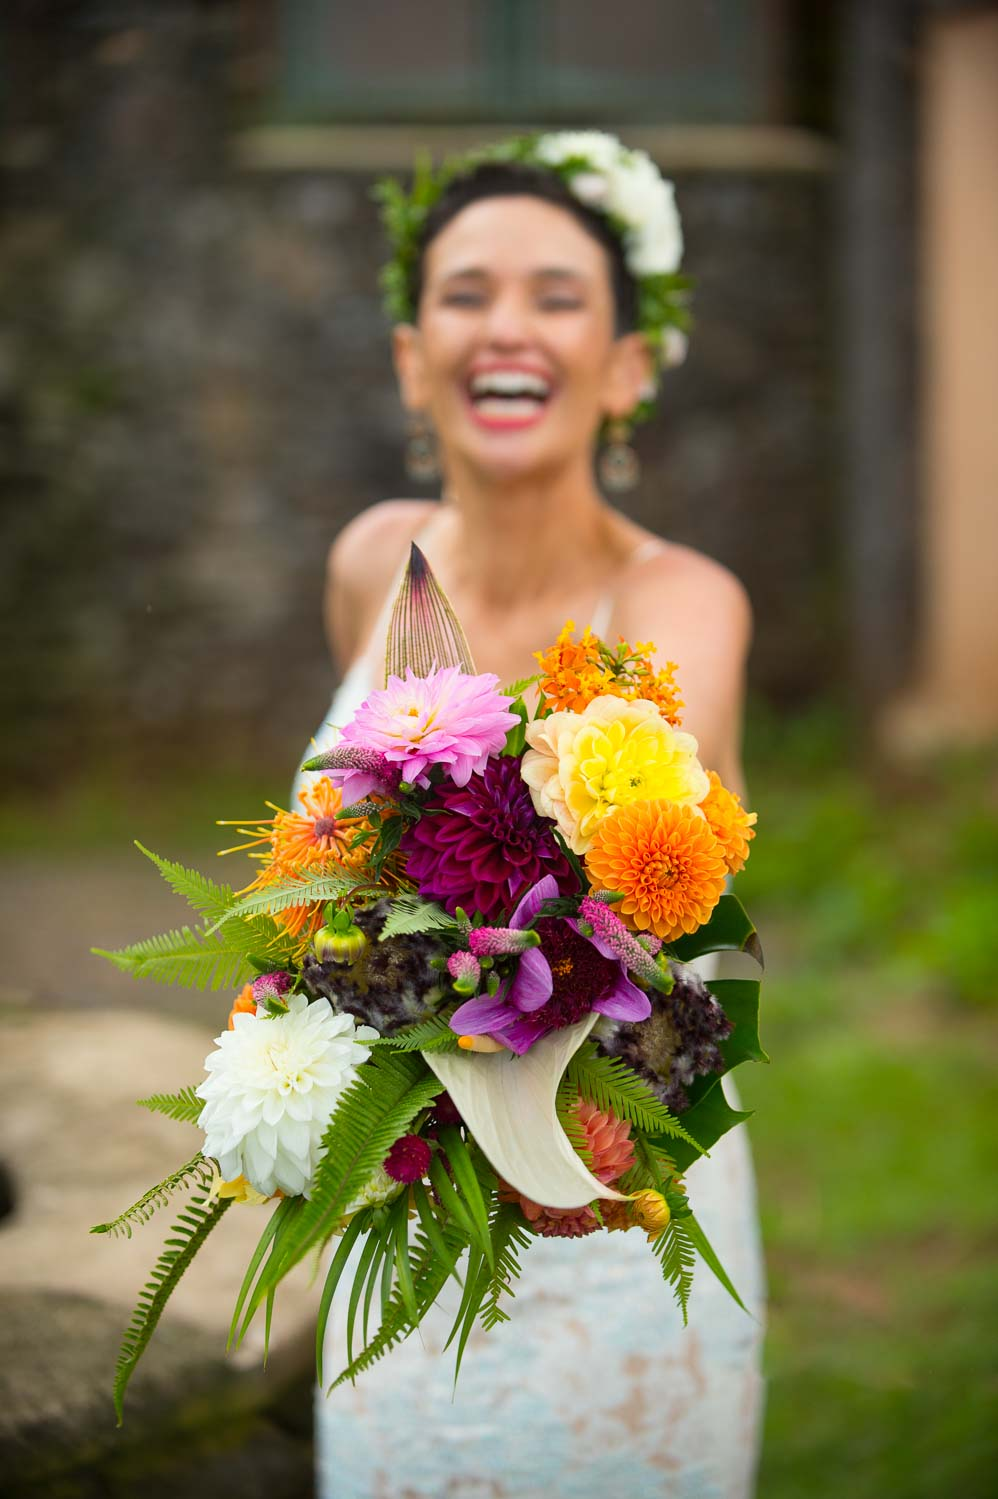 maui-wedding-photography-maui-wedding-venue-Tad-Craig-Photography-49.jpg